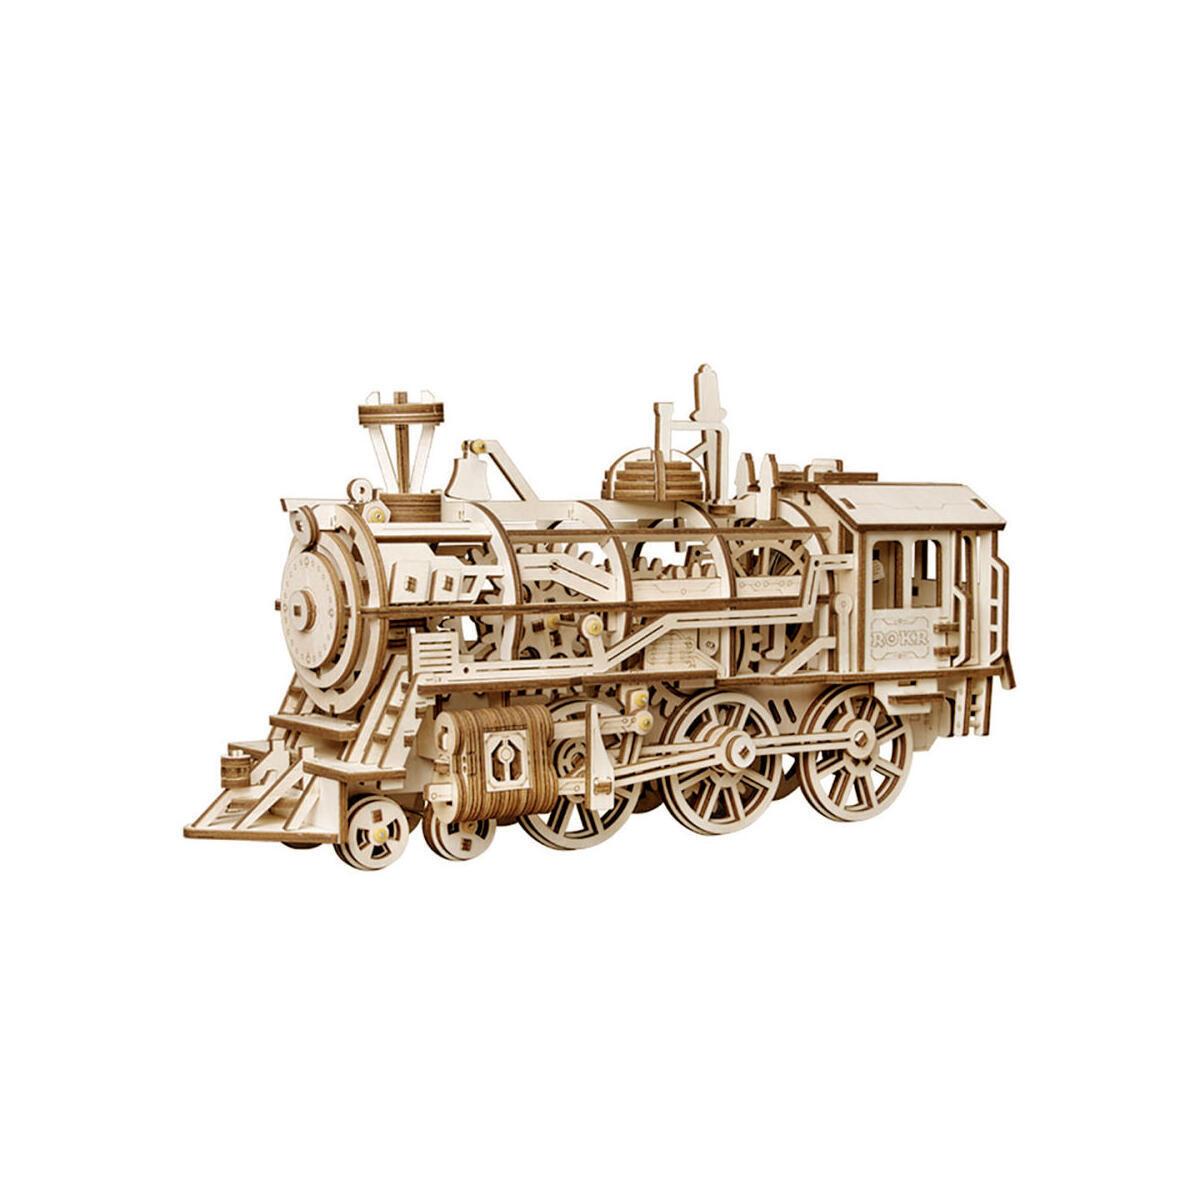 3D Wooden Puzzle Models - Kids & Adults - Various